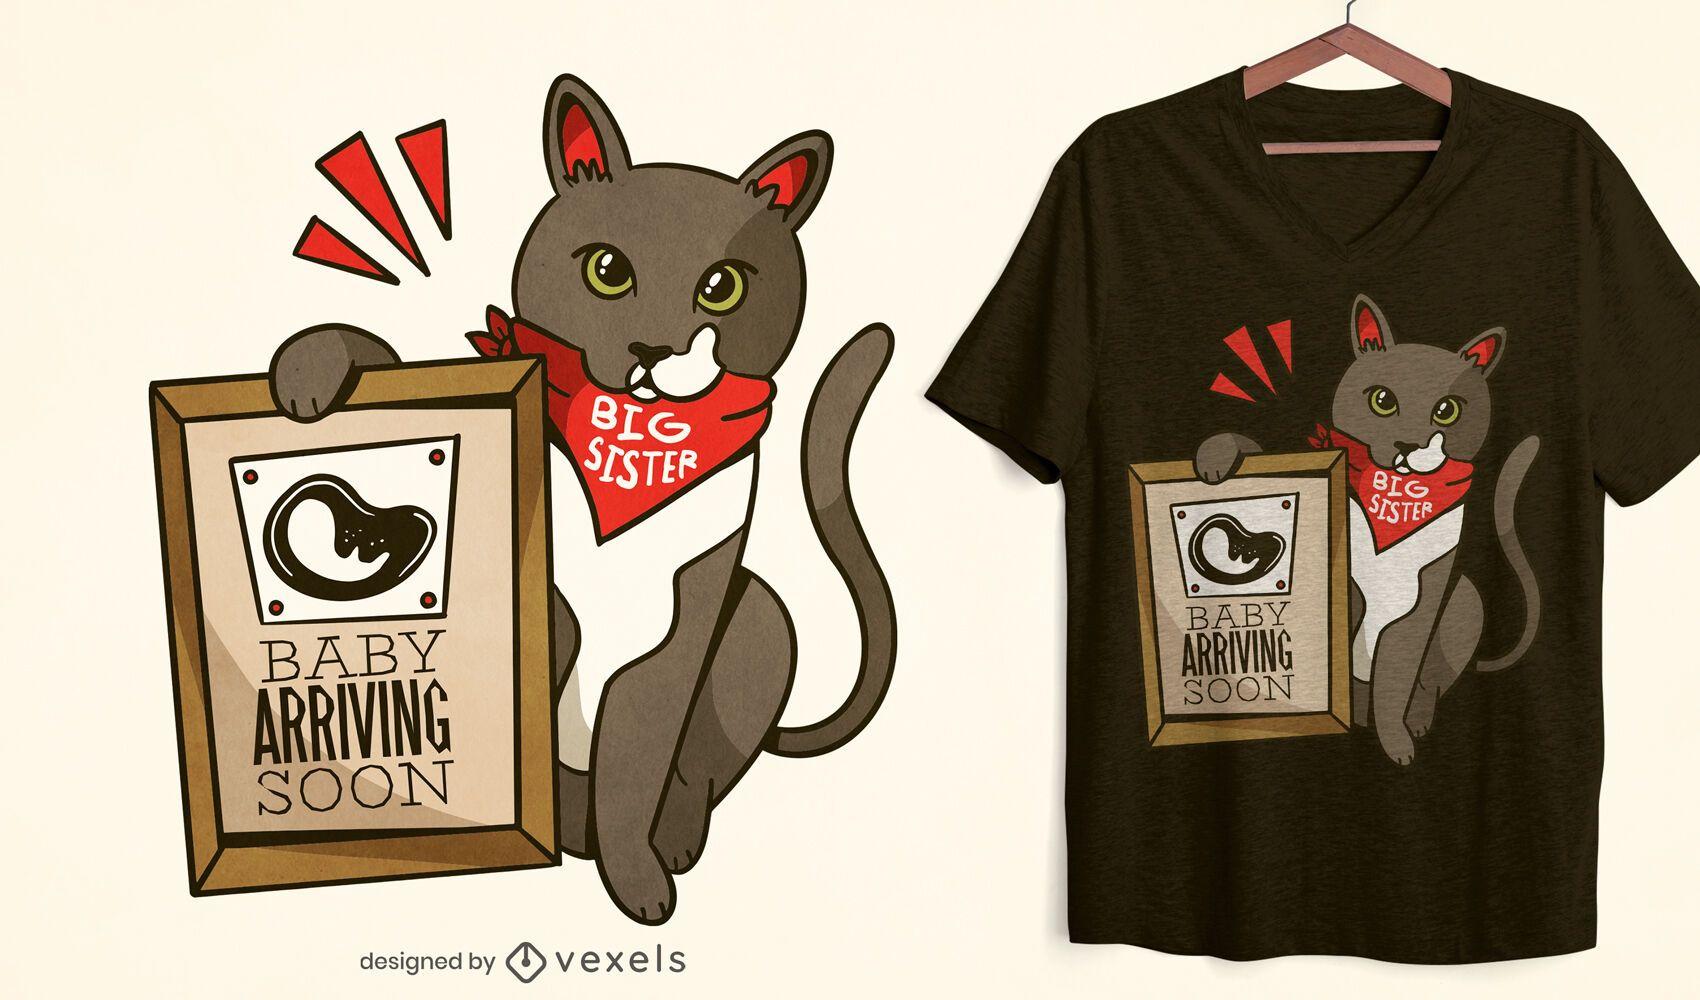 Baby arriving soon cat t-shirt design